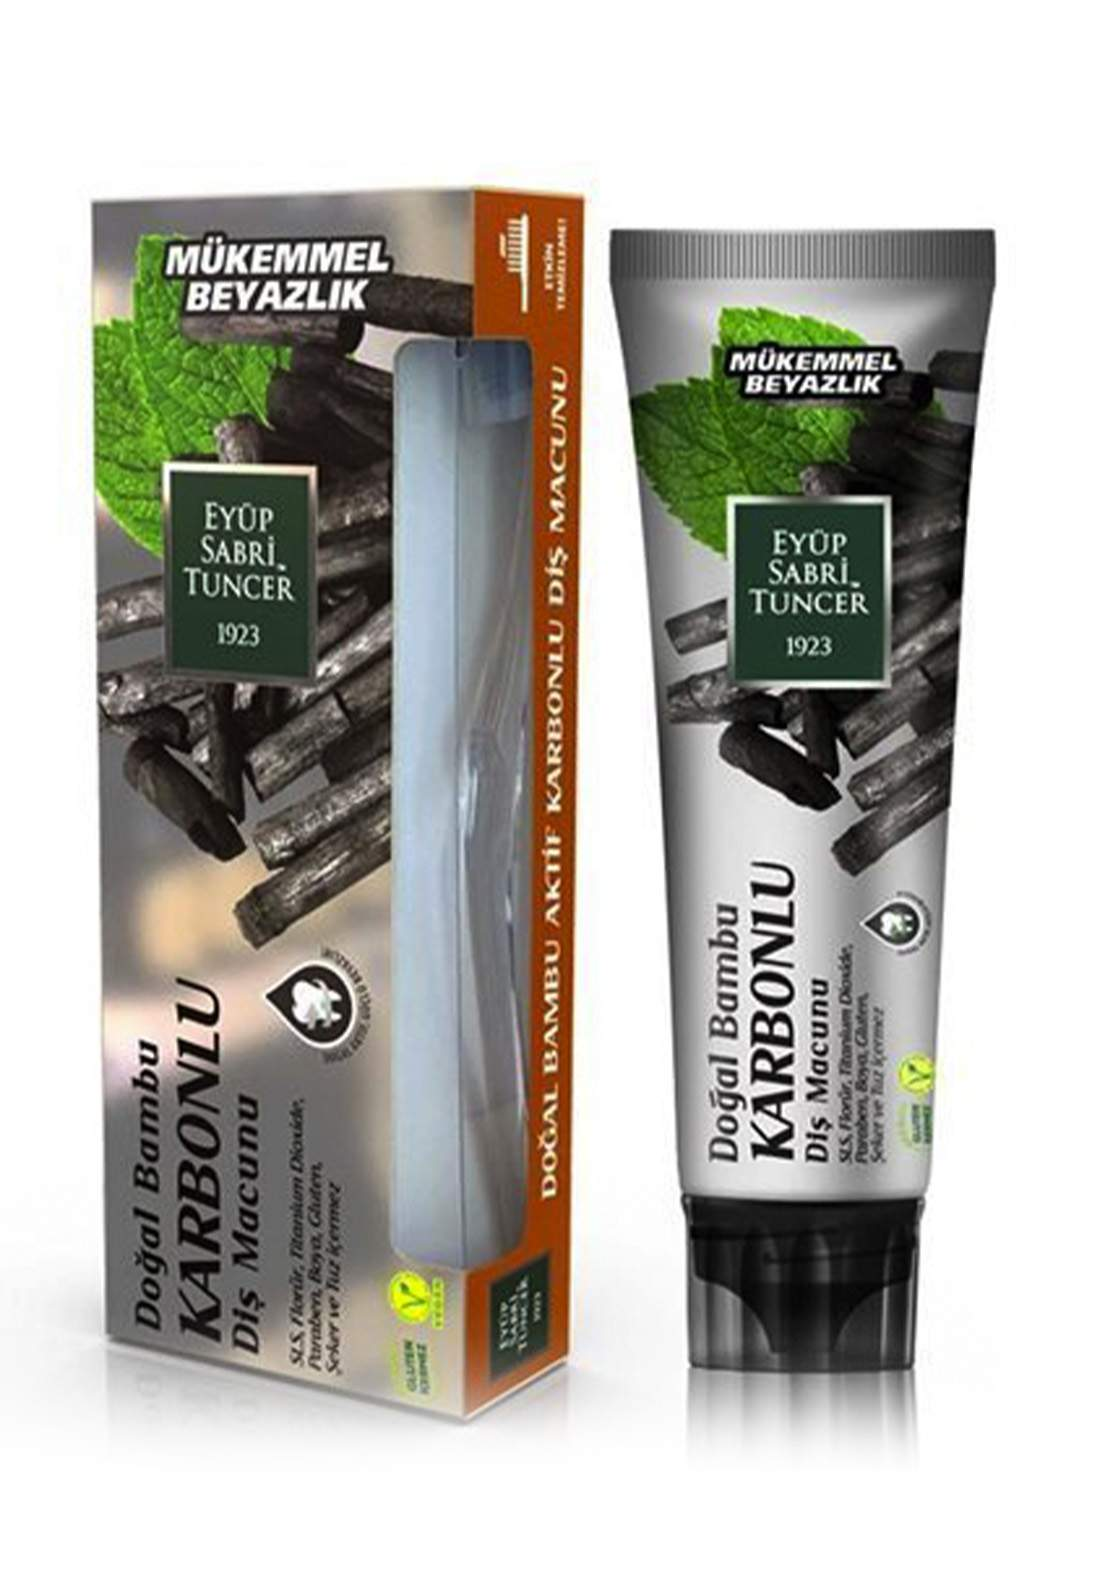 Eyup Sabri Tuncer Natural Bamboo Activated Charcoal Toothpaste 75ml  معجون أسنان بلفحم الطبيعي مع فرشاة